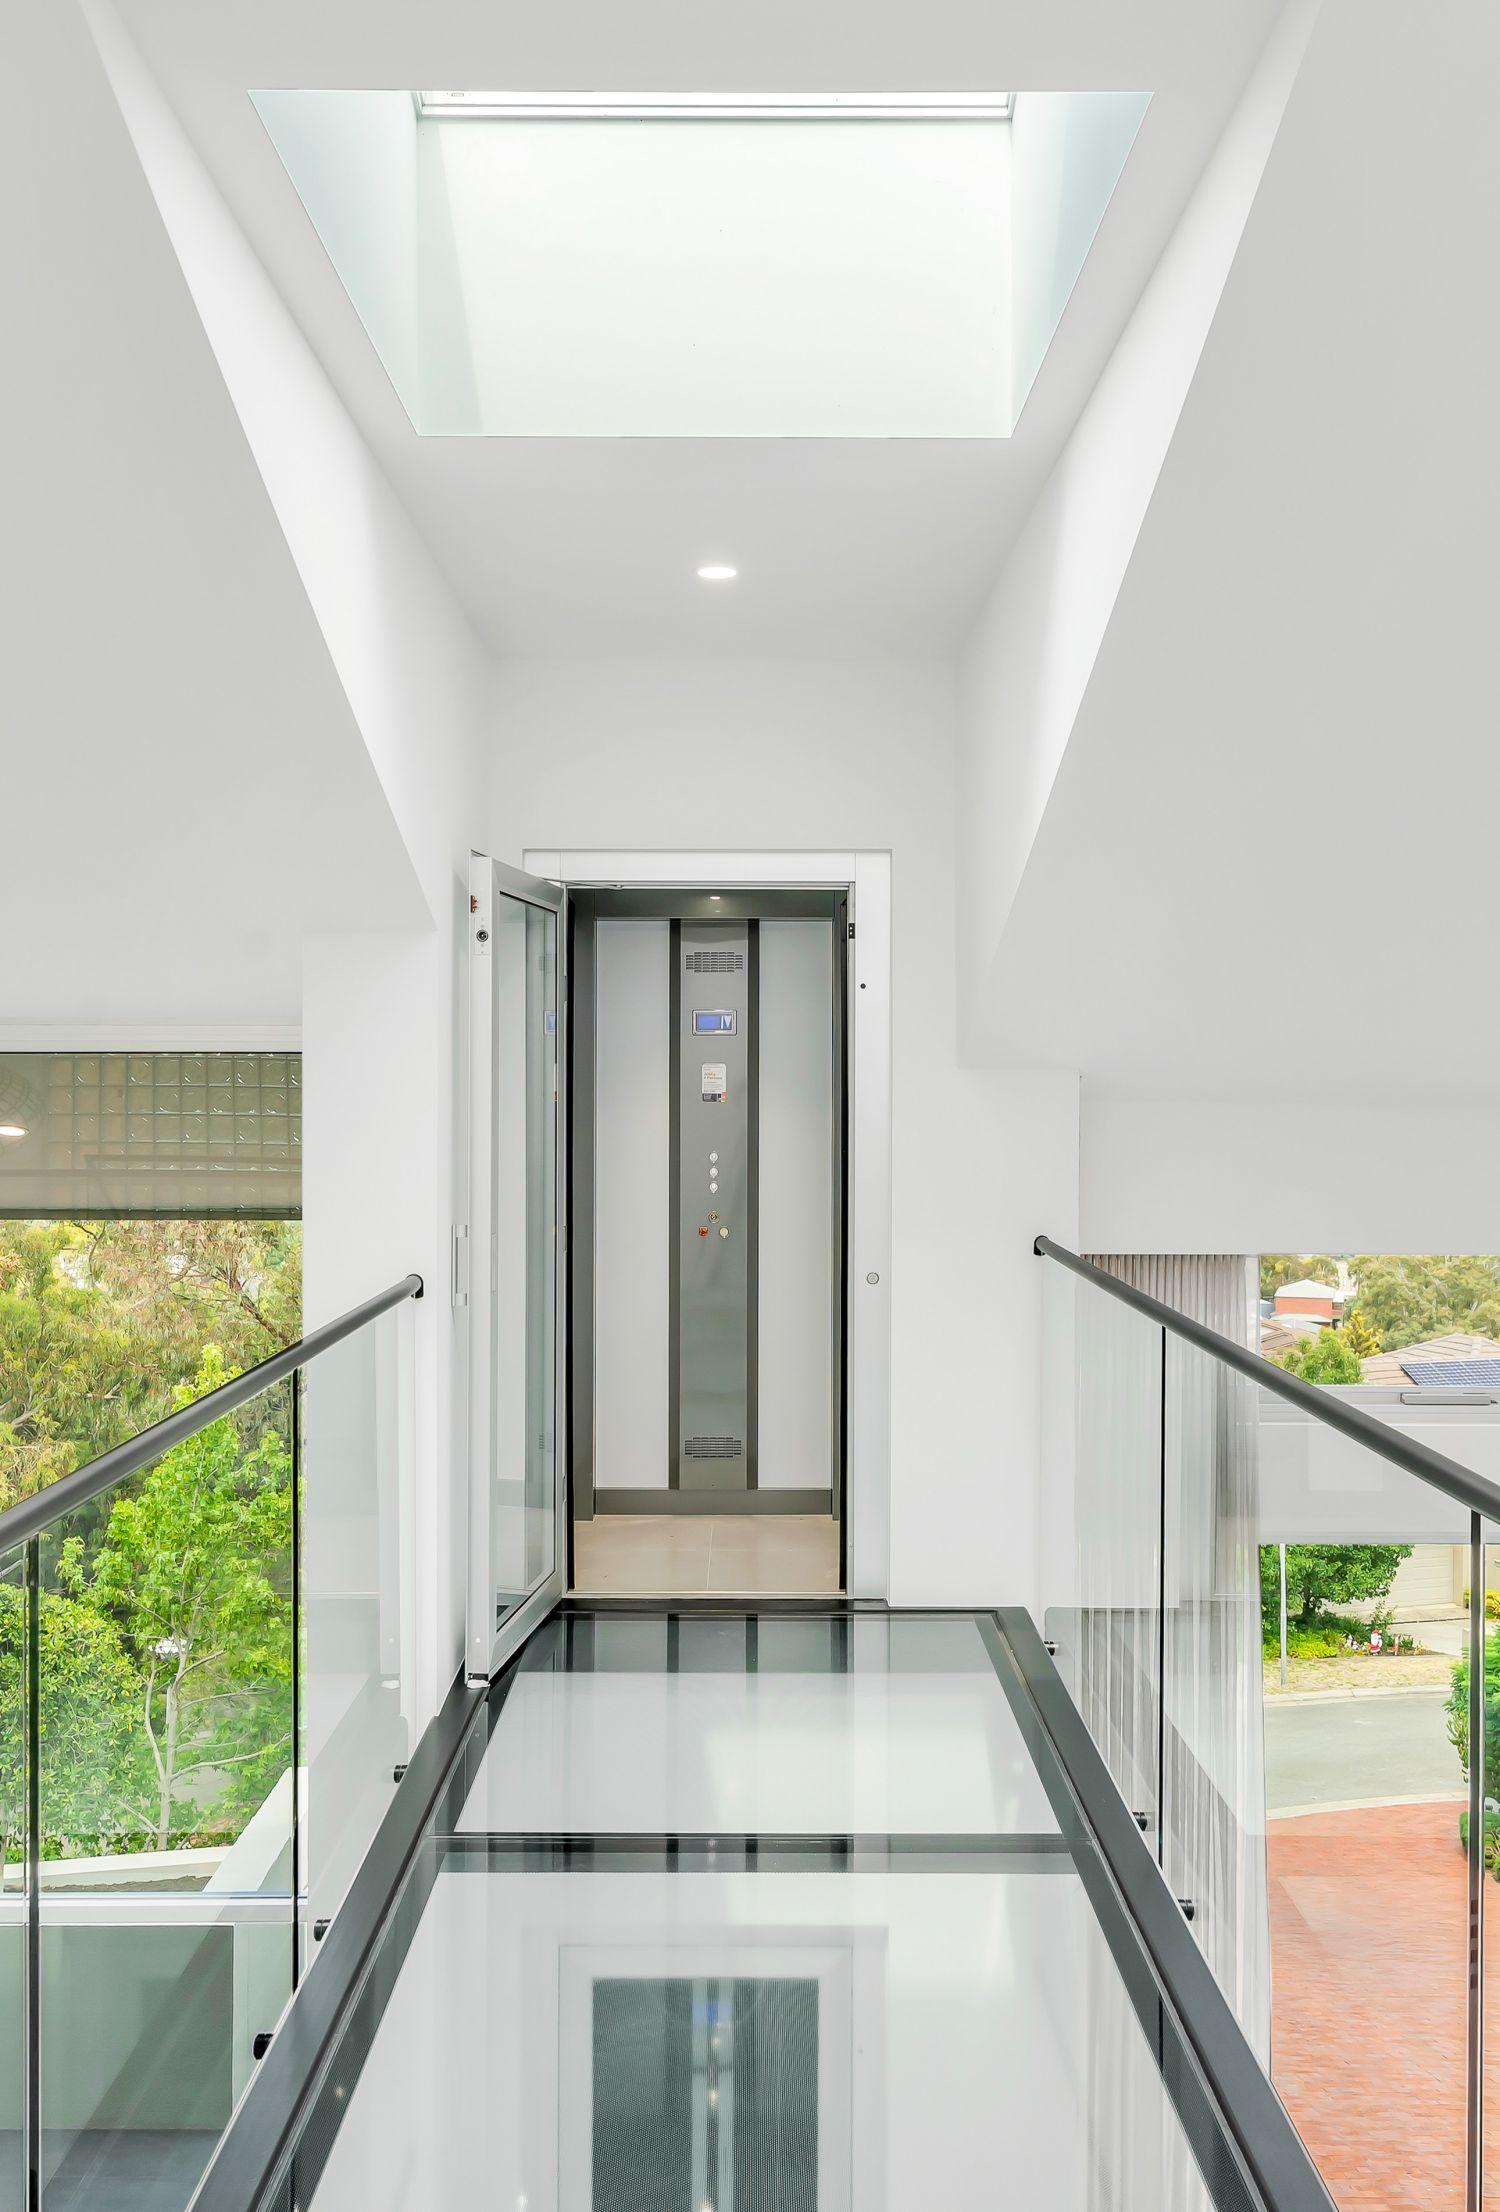 Adelaide Home Lifts Genius 300 Auldana Walkway to Lift